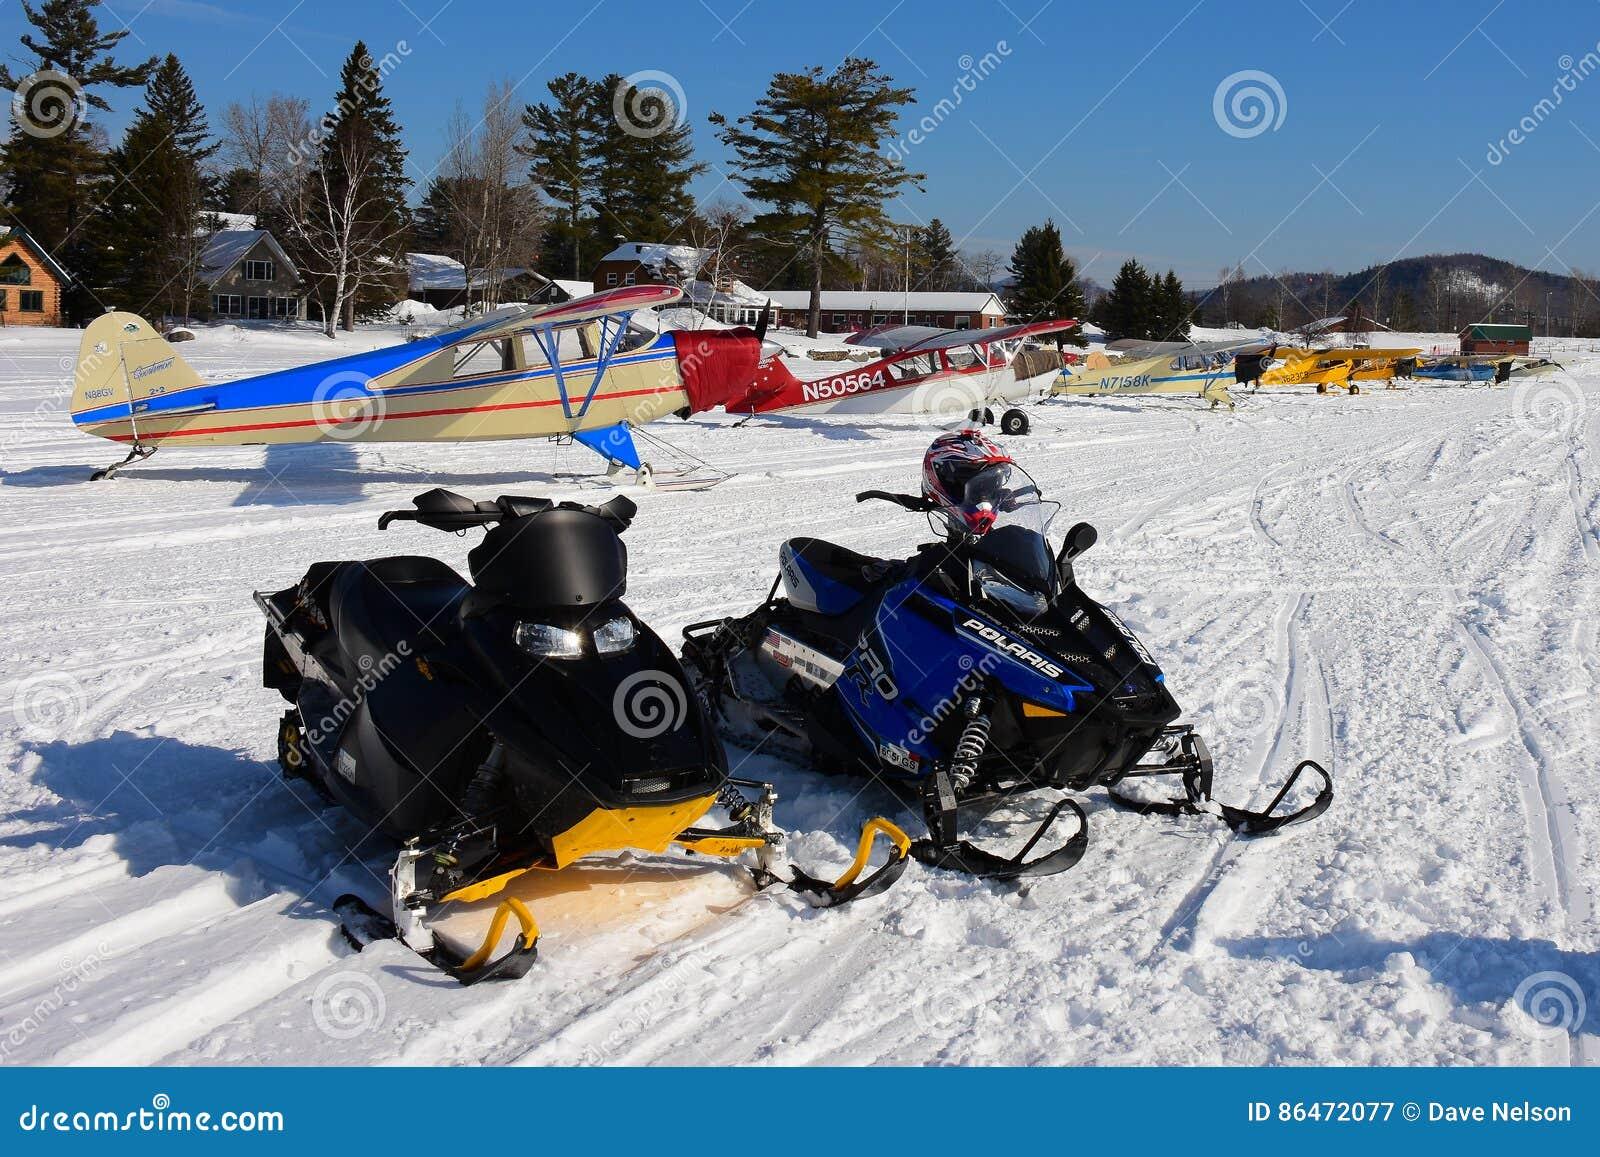 Snowmobiles and ski planes